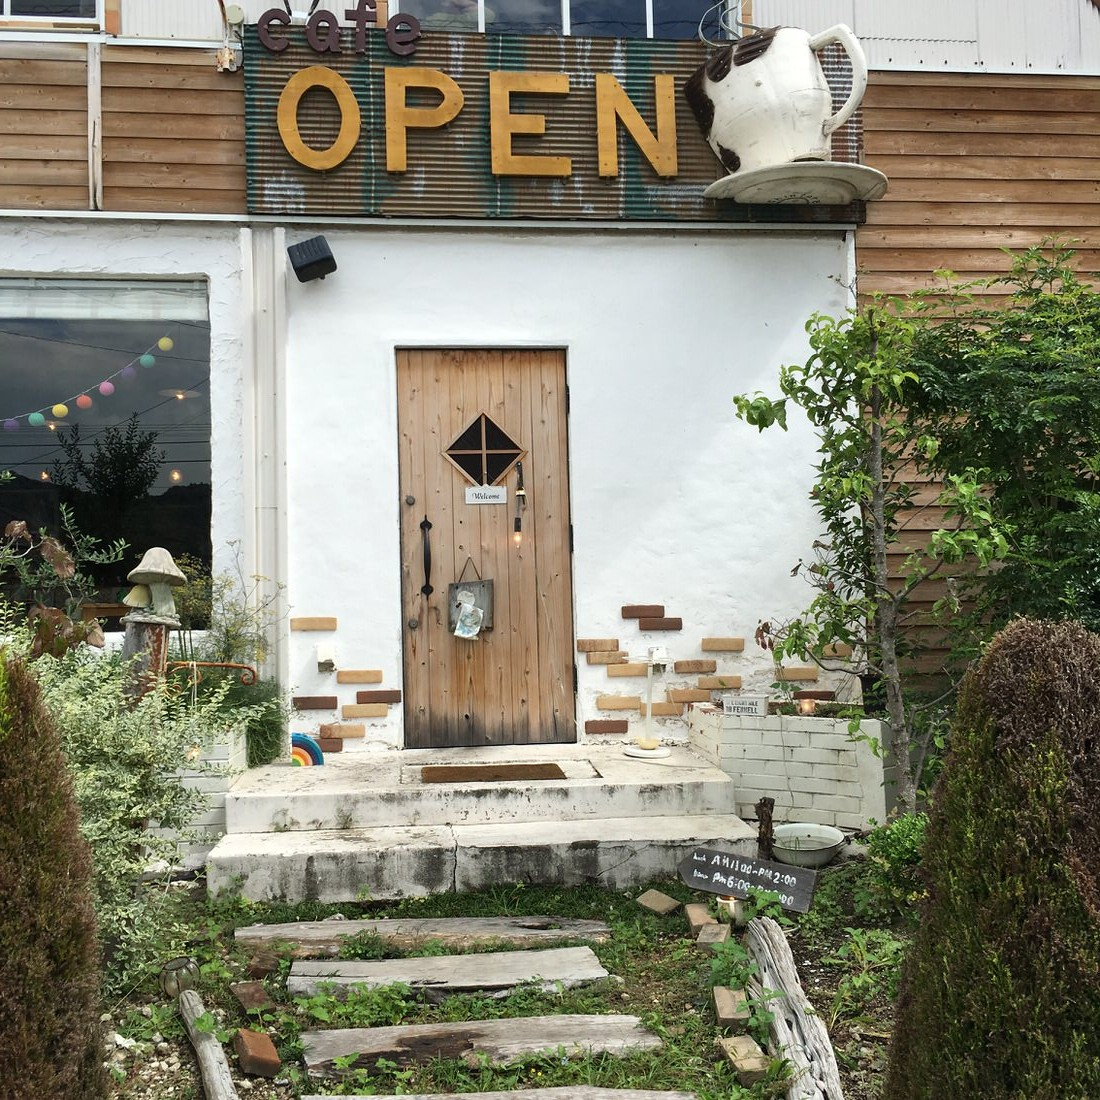 cafe-open-外観